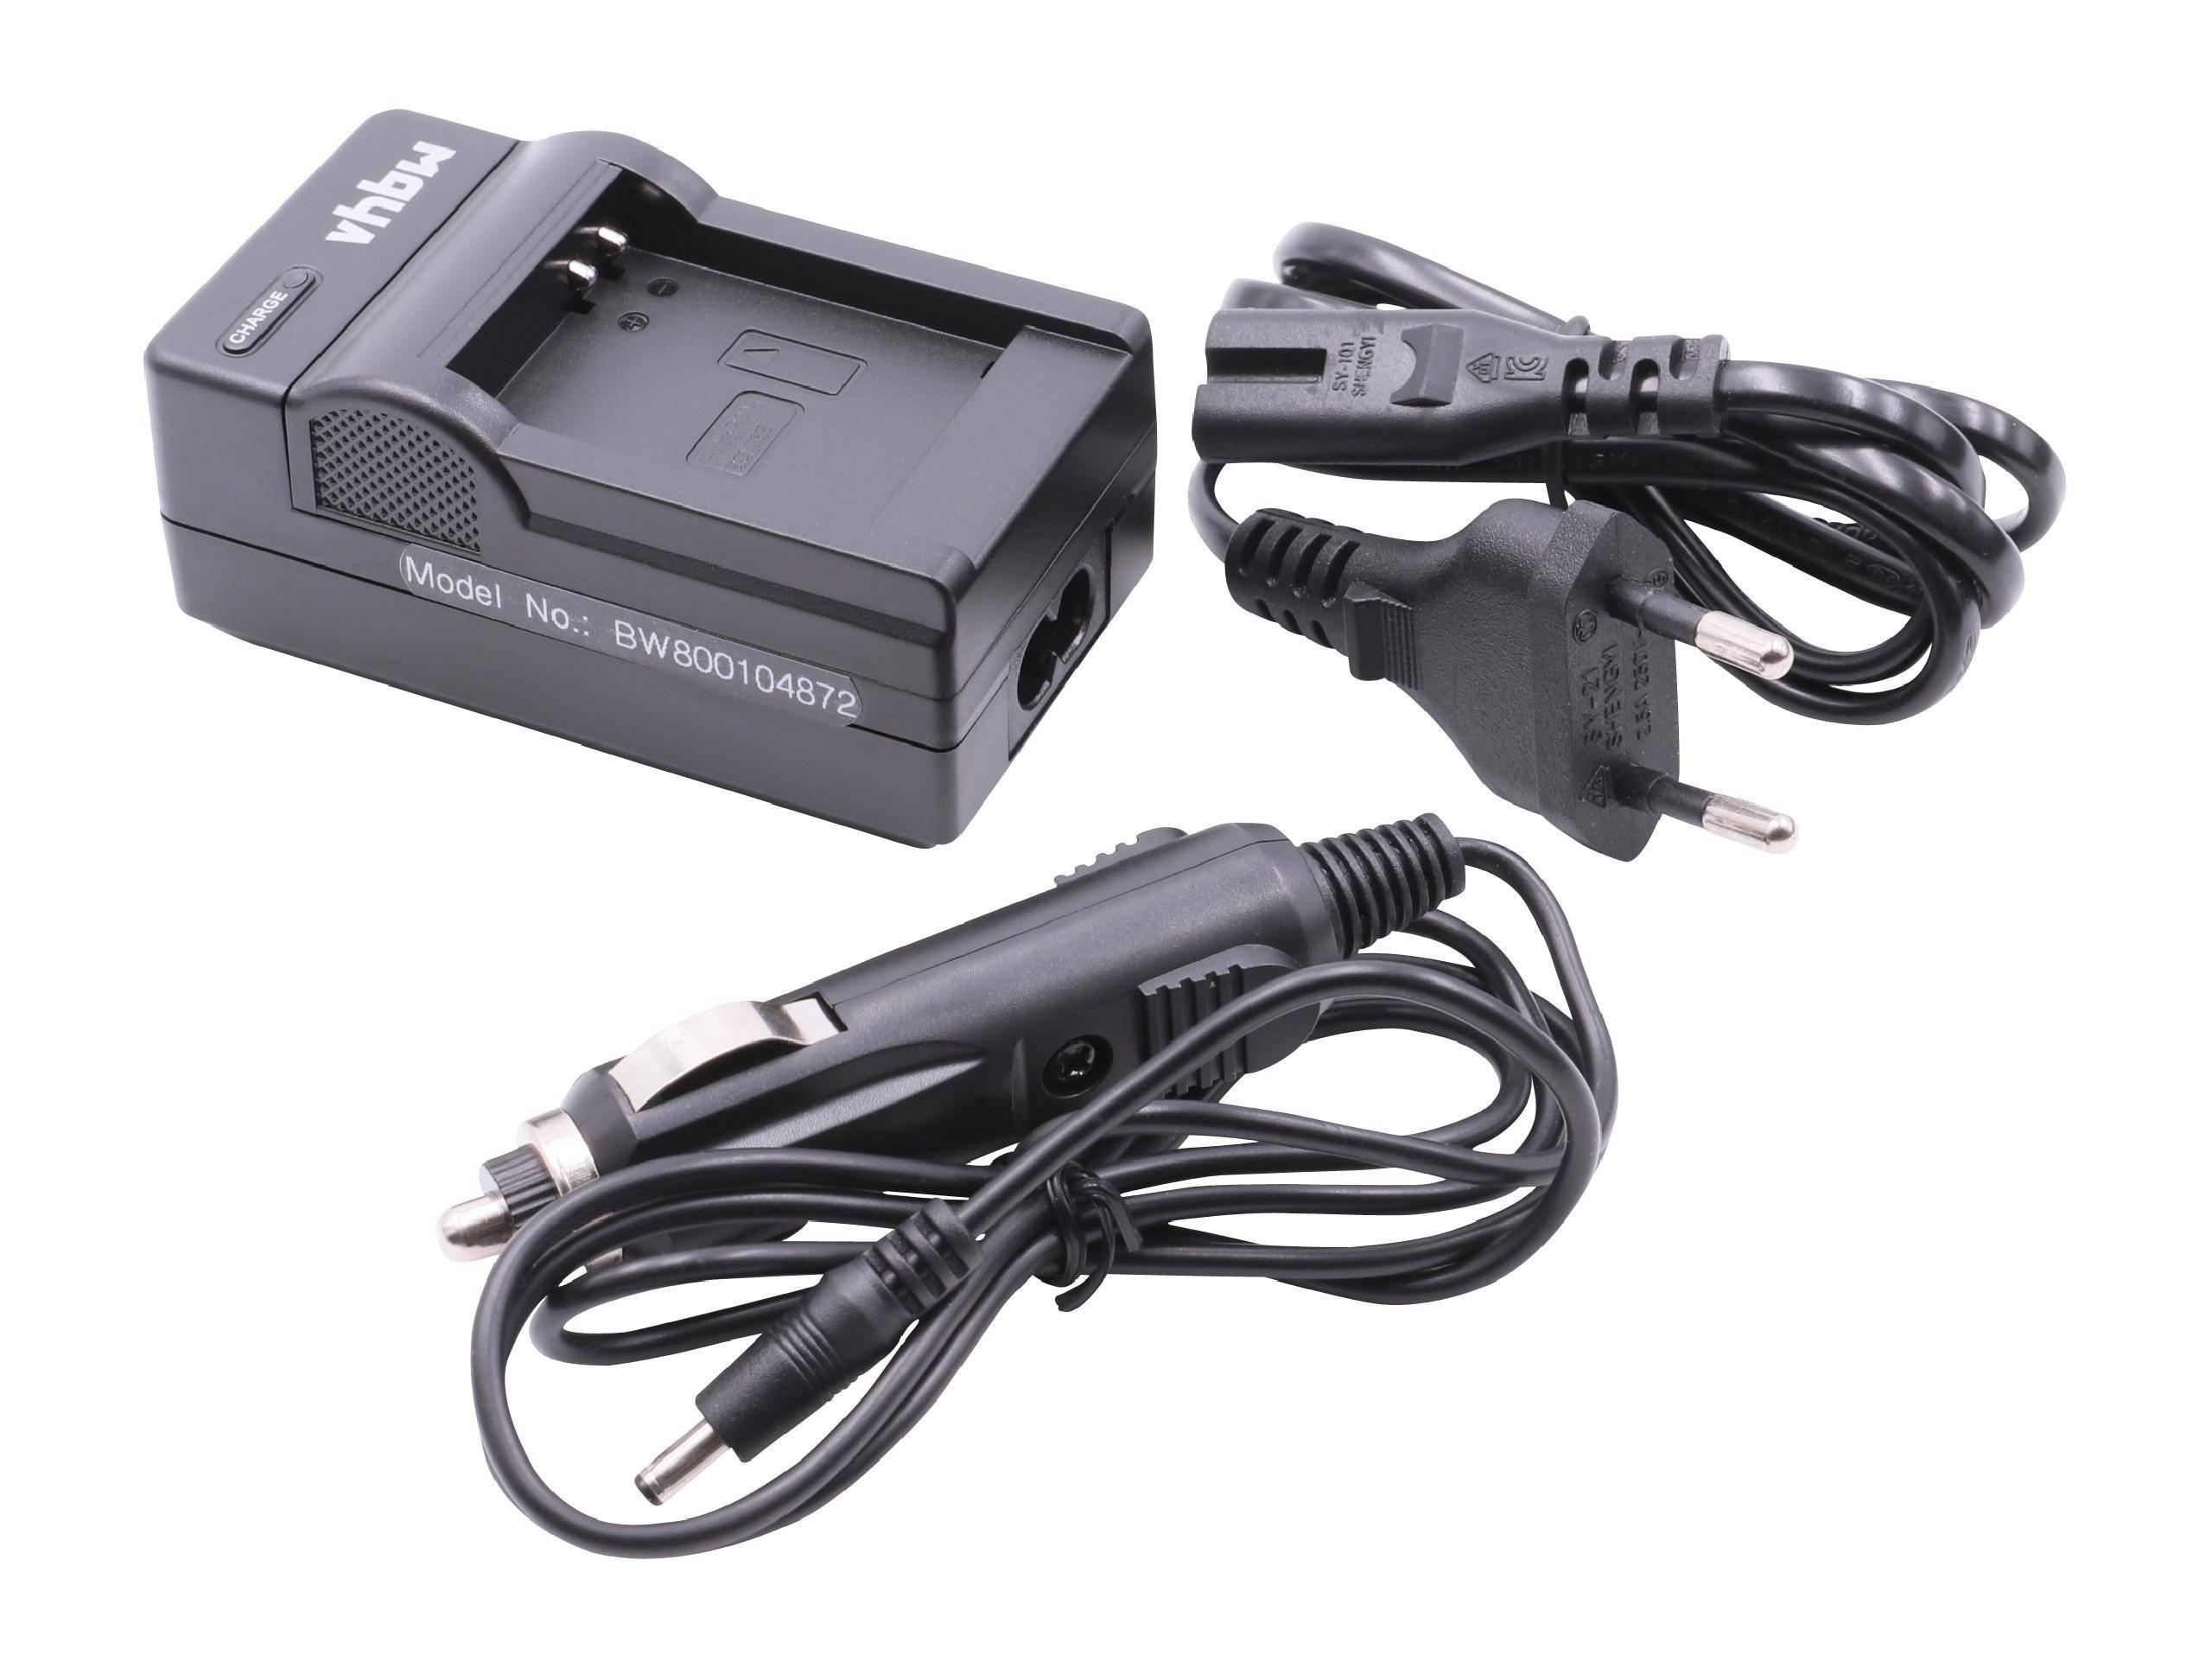 Tool Daily Druckreiniger-Adapter-Set 9,5 mm Au/ßengewinde-Anschluss Schnellanschluss-Set 5000 PSI 1# 3//8 Quick Connect Kit -Male